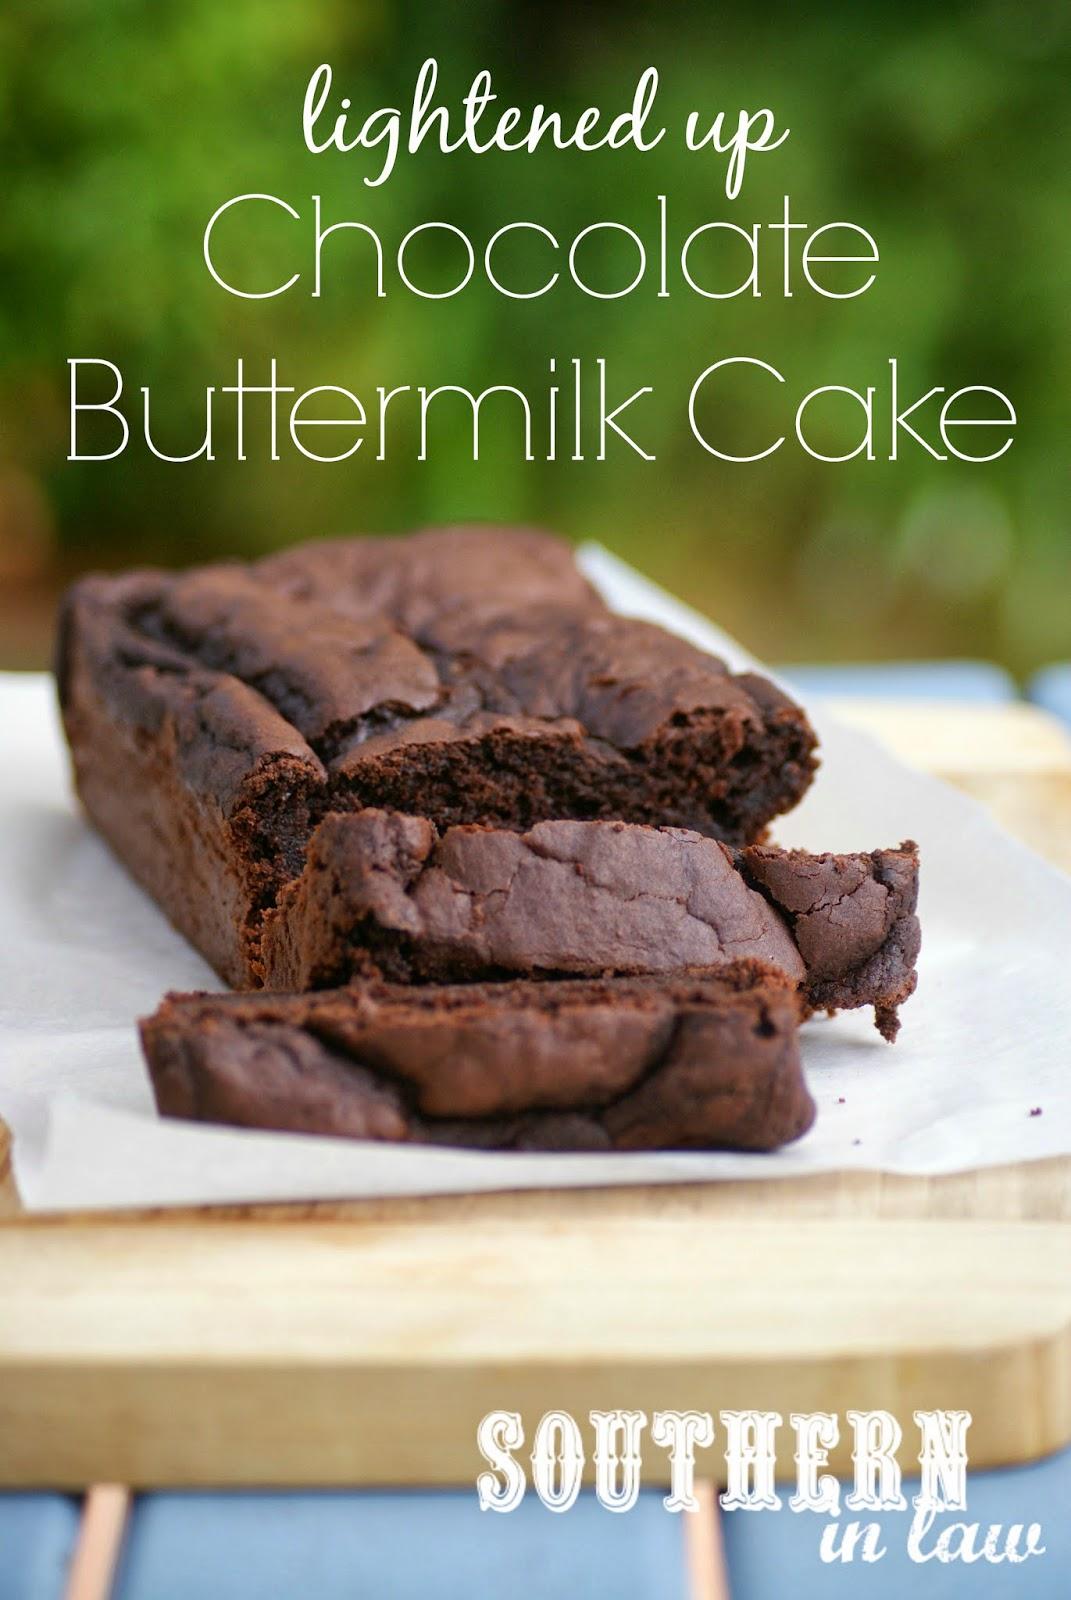 Low Fat Buttermilk Chocolate Cake Recipe - Gluten free, healthy, low sugar, lightened up